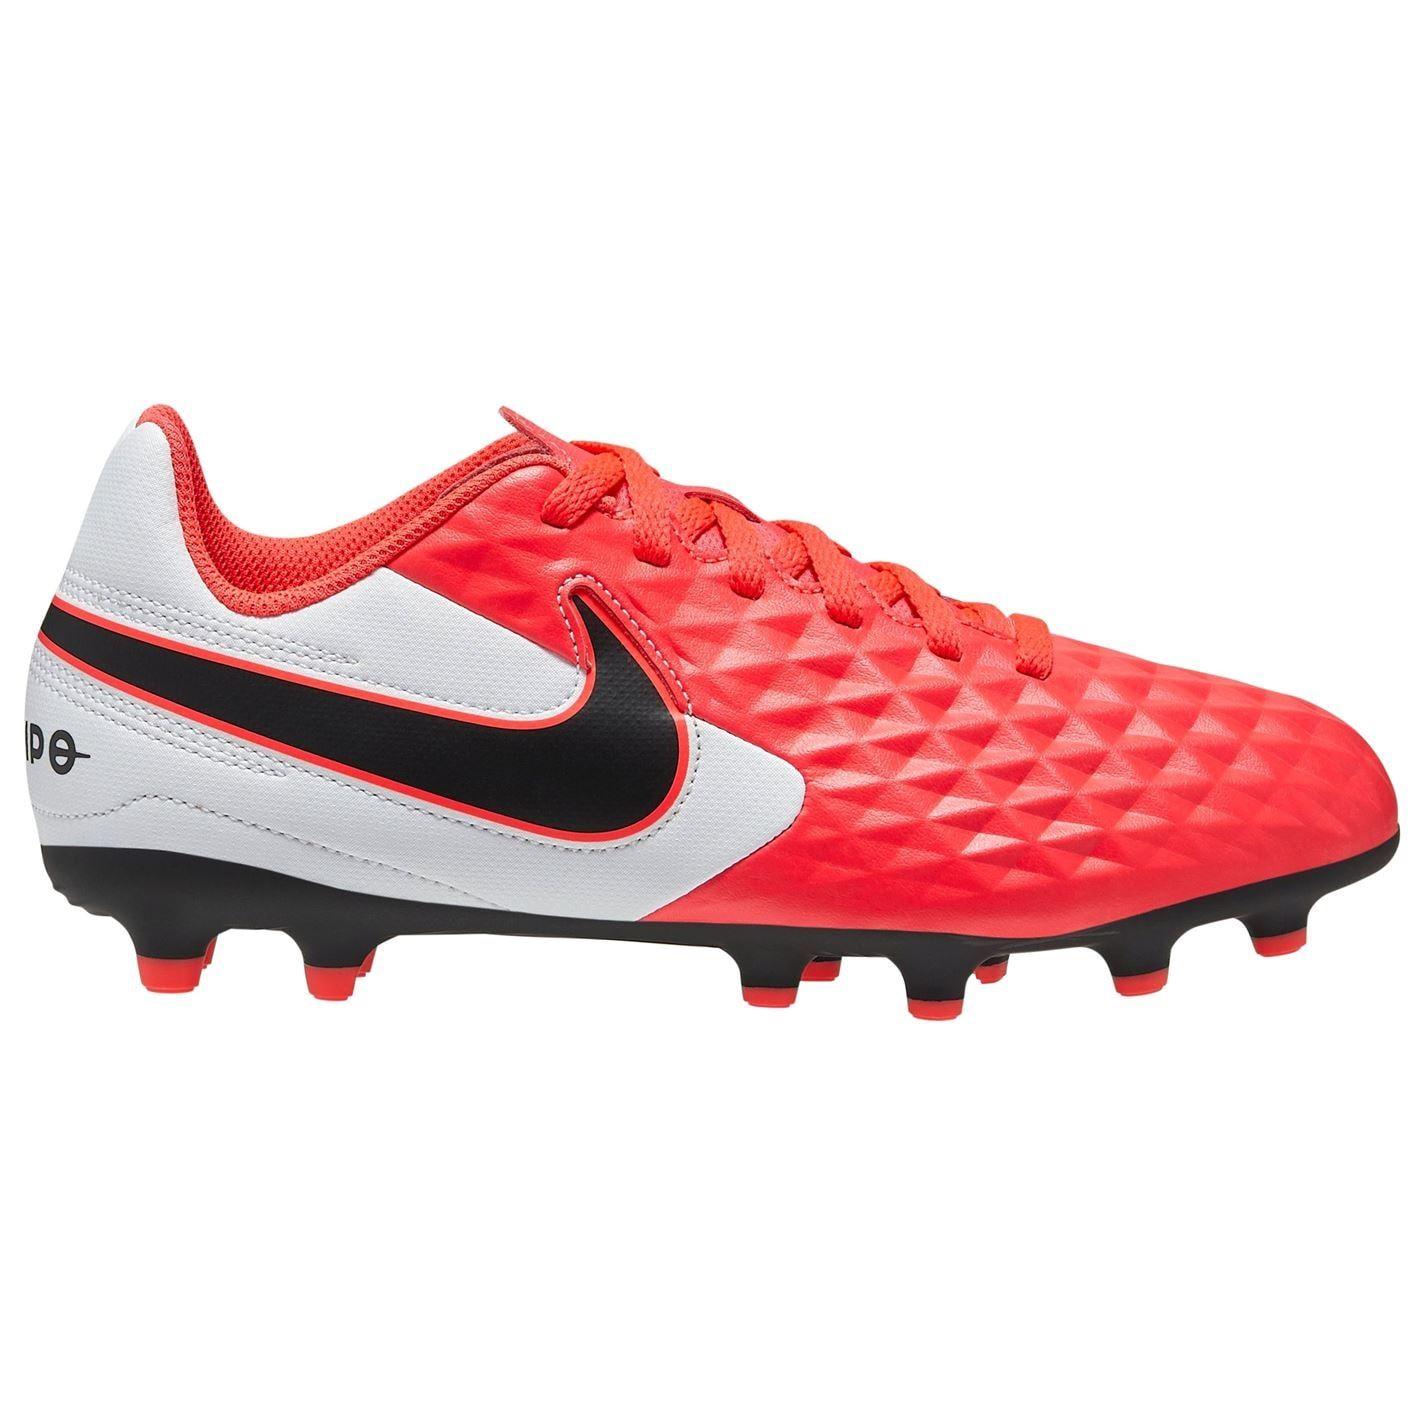 miniature 19 - Nike-Tiempo-Legend-Academy-Junior-FG-Firm-Ground-football-boots-Boys-Football